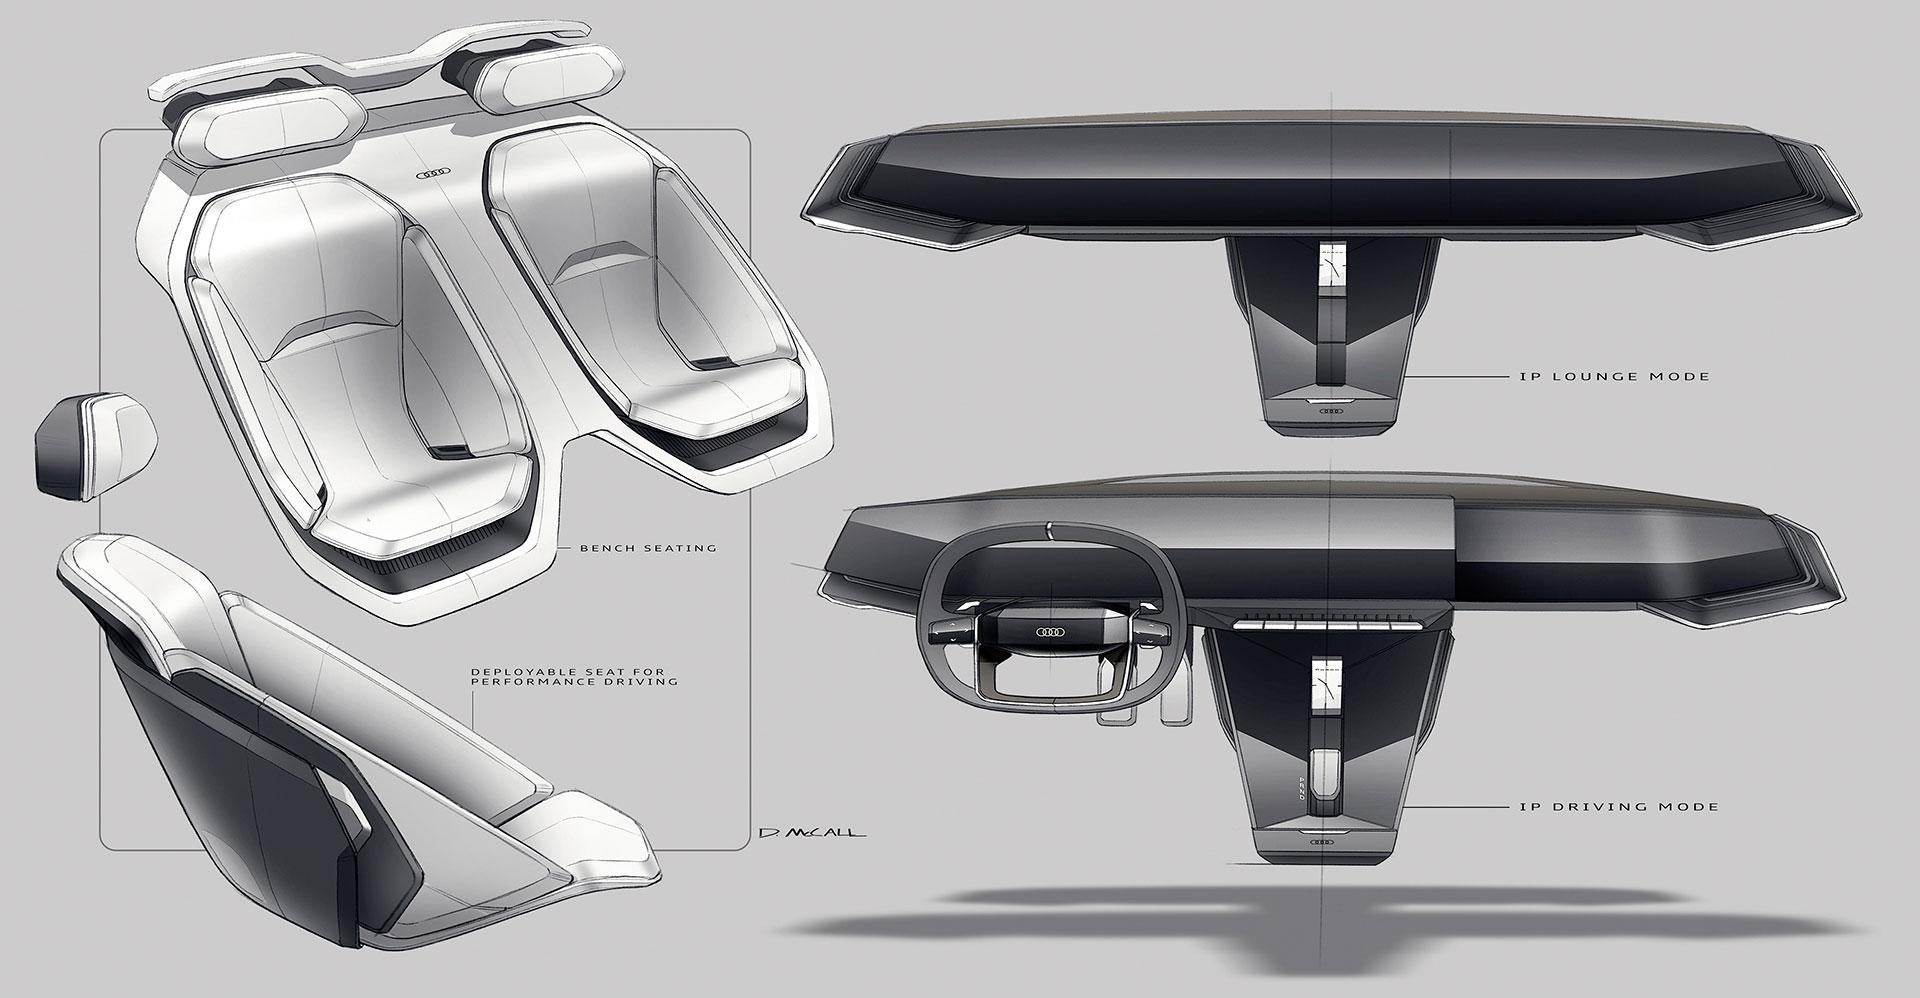 2021, audi, concept, skysphere